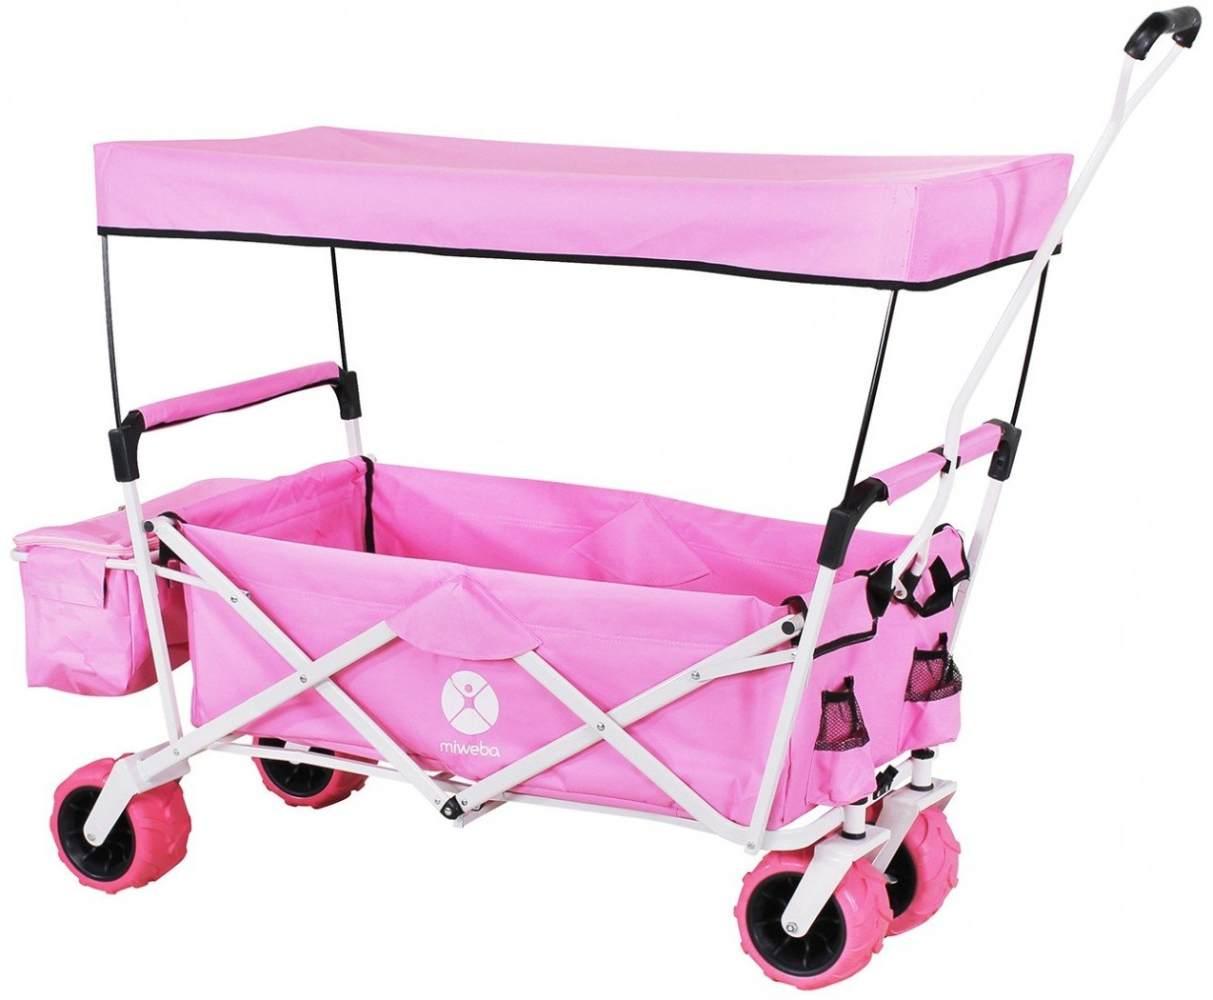 Miweba faltbarer Bollerwagen Pink Bild 1